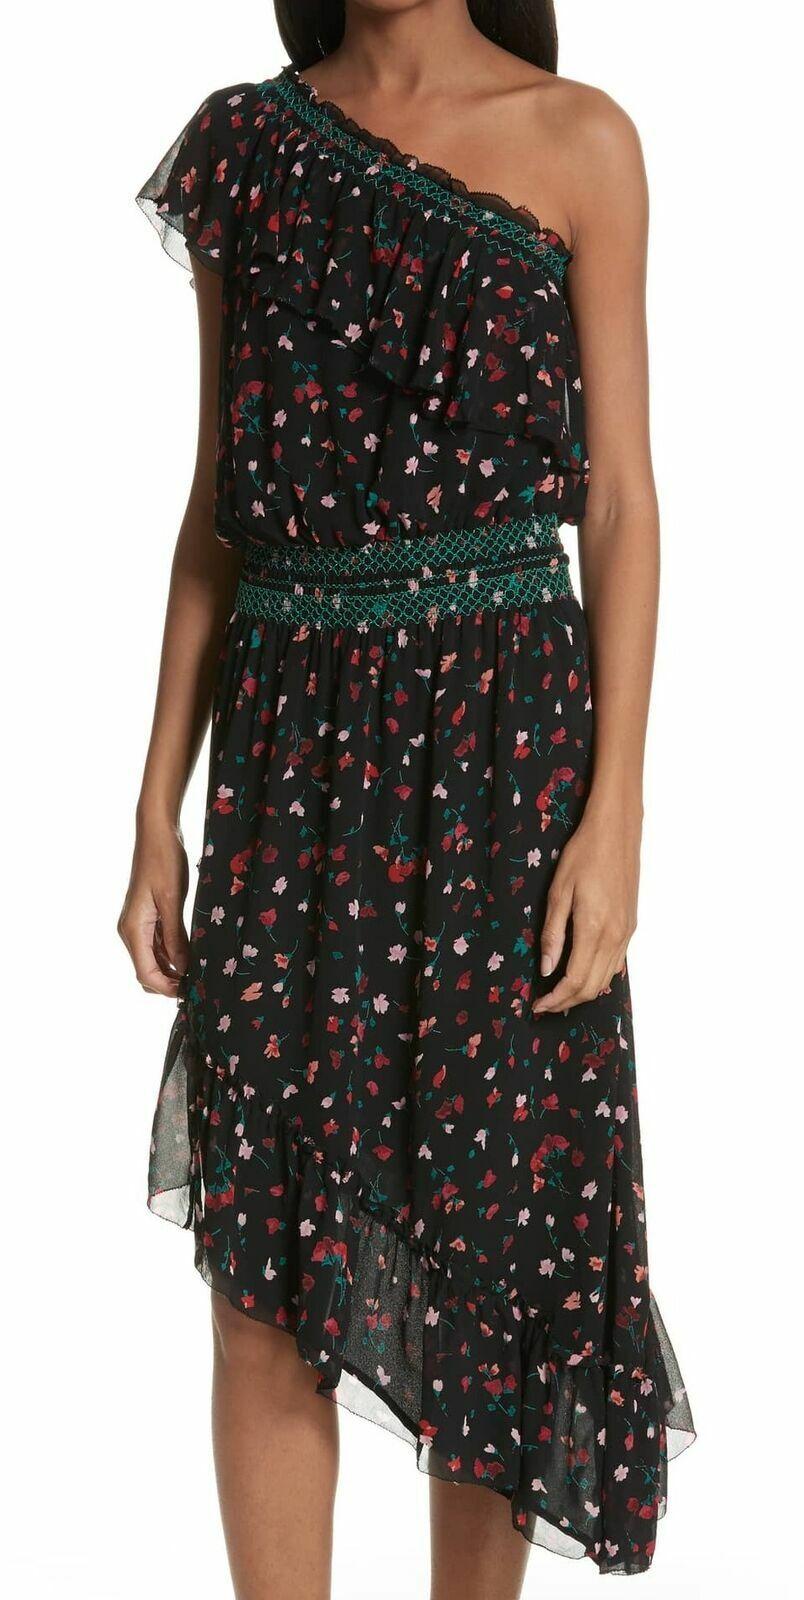 NEW Joie Floral Asymmetric Silk Dress in schwarz Multi - Größe S  D2137